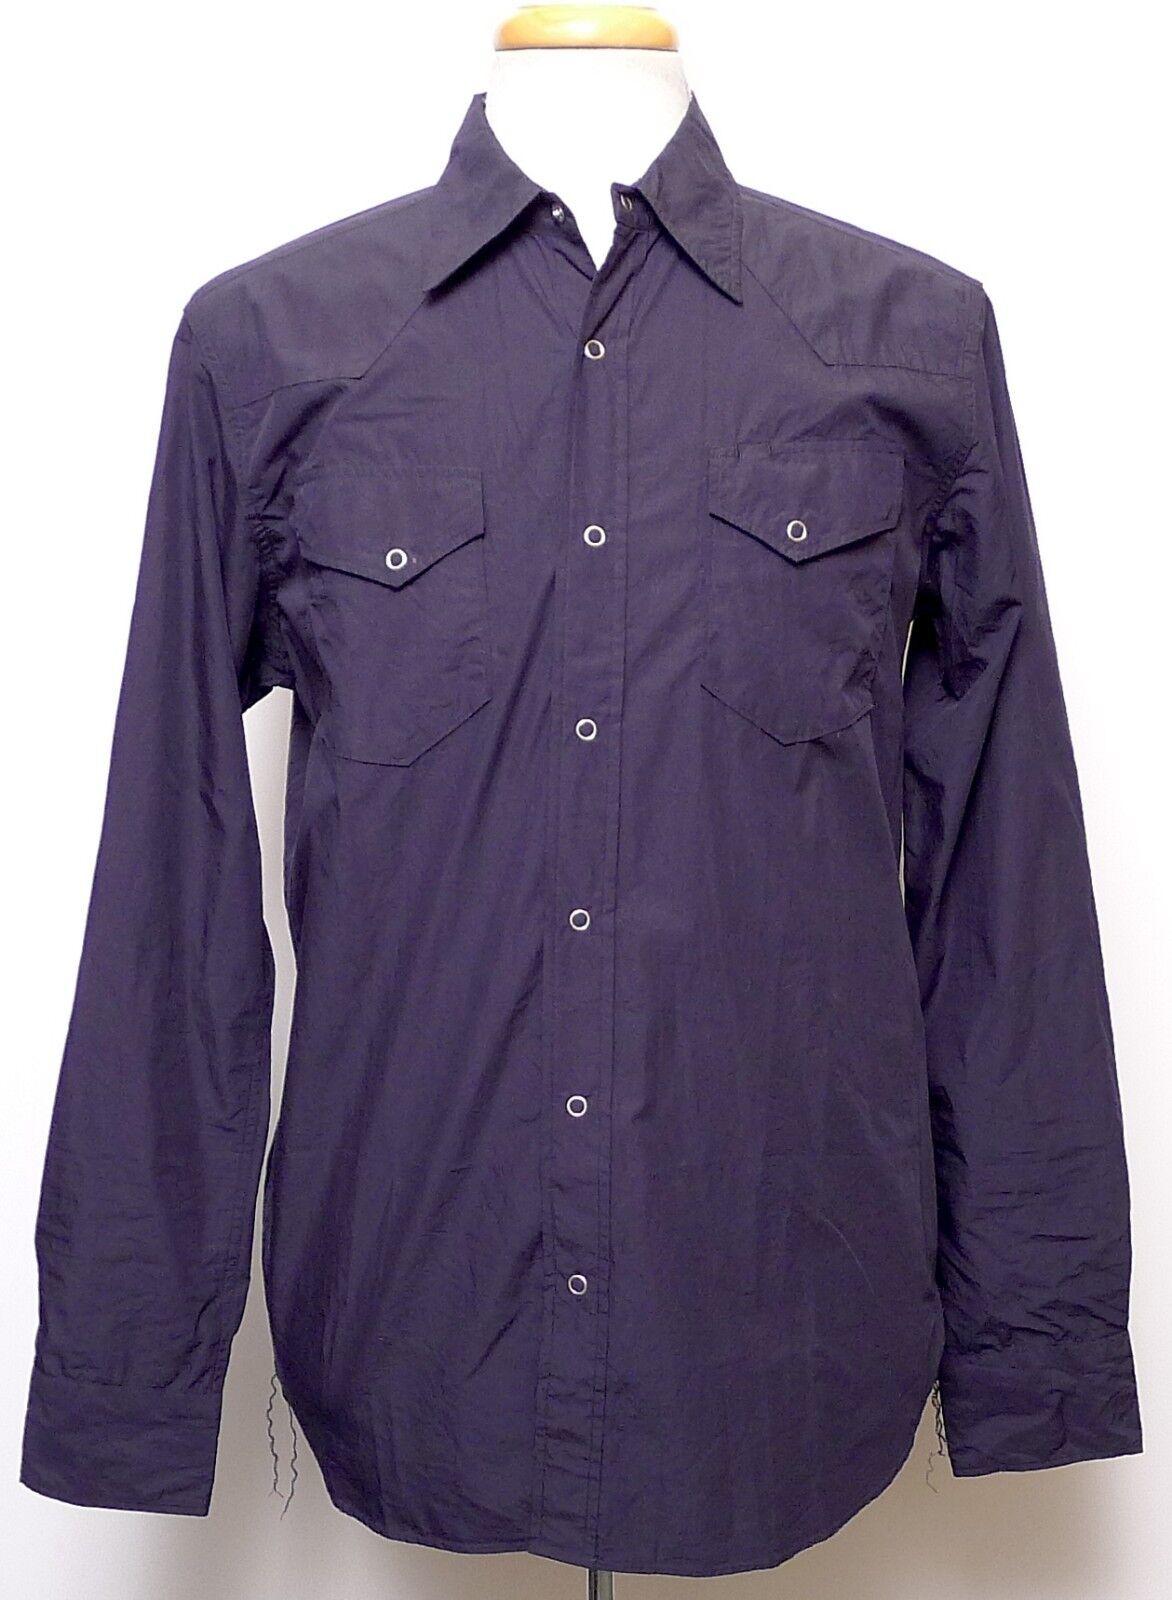 Shuttle Notes Men's Master Cloth bluee Alternative Style Shirt NWT